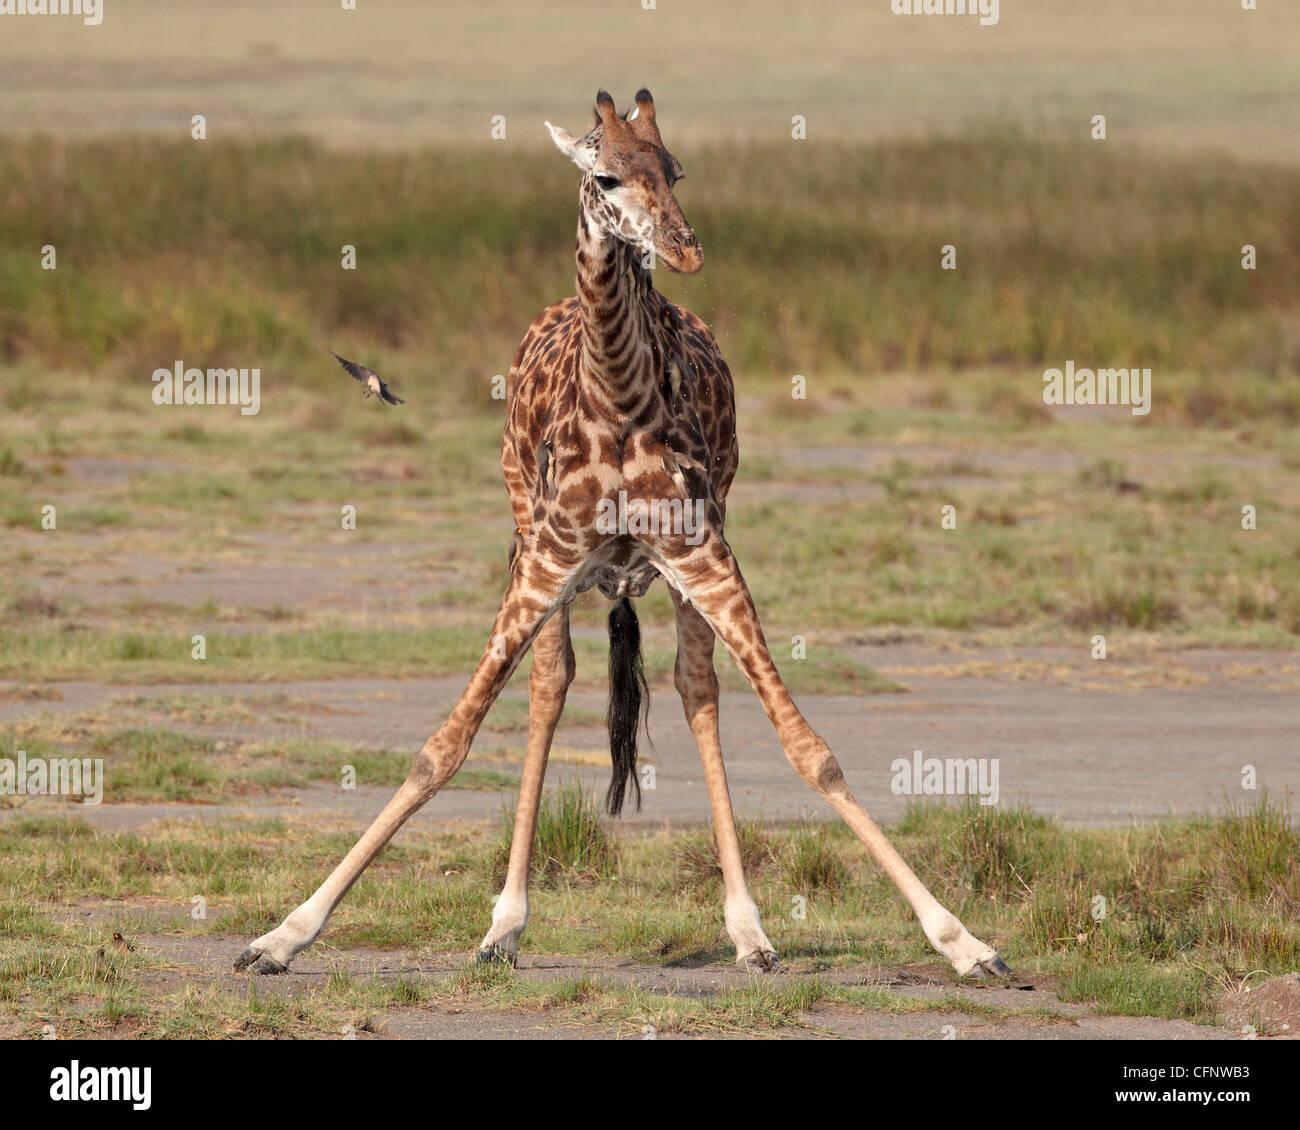 Masai giraffe (Giraffa camelopardalis tippelskirchi) drinking, Serengeti National Park, Tanzania, East Africa, Africa - Stock Image